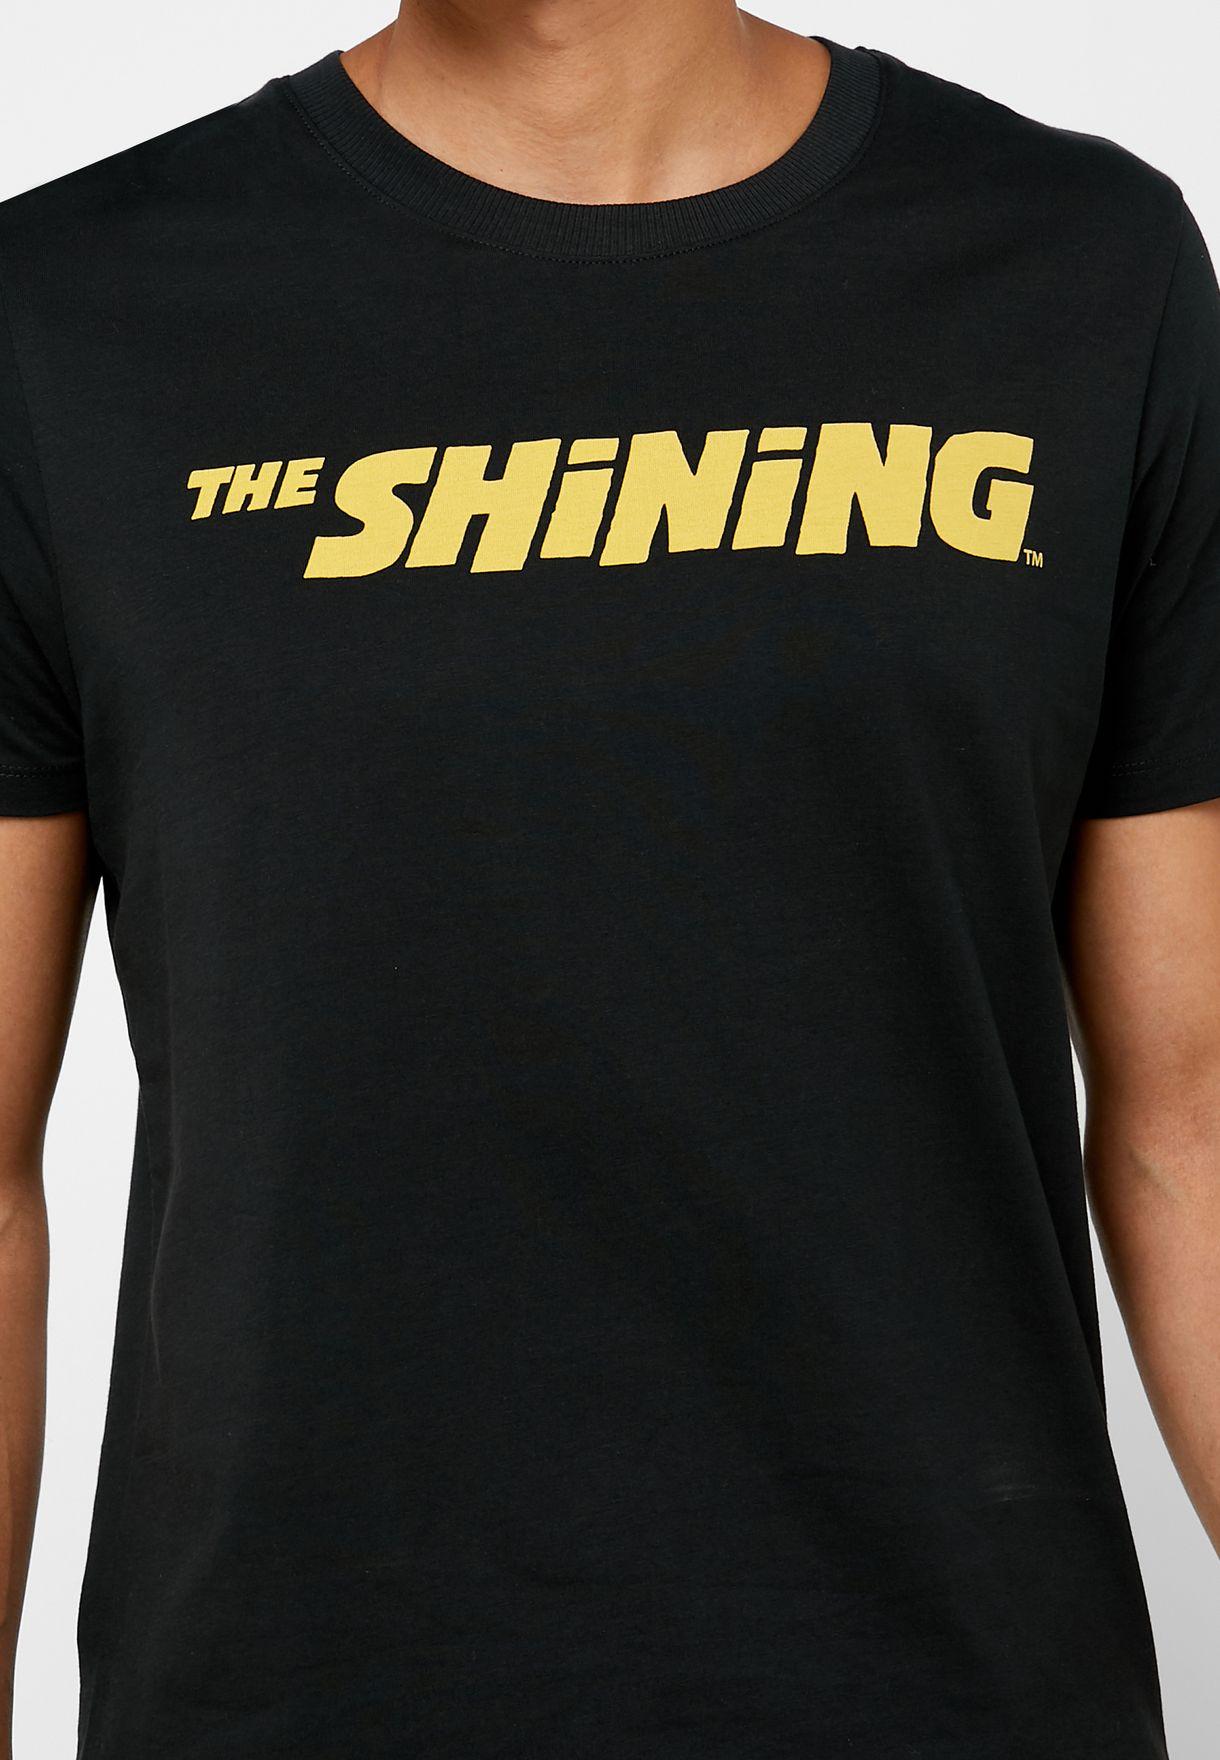 The Shining Oversize Crew Neck T-Shirt